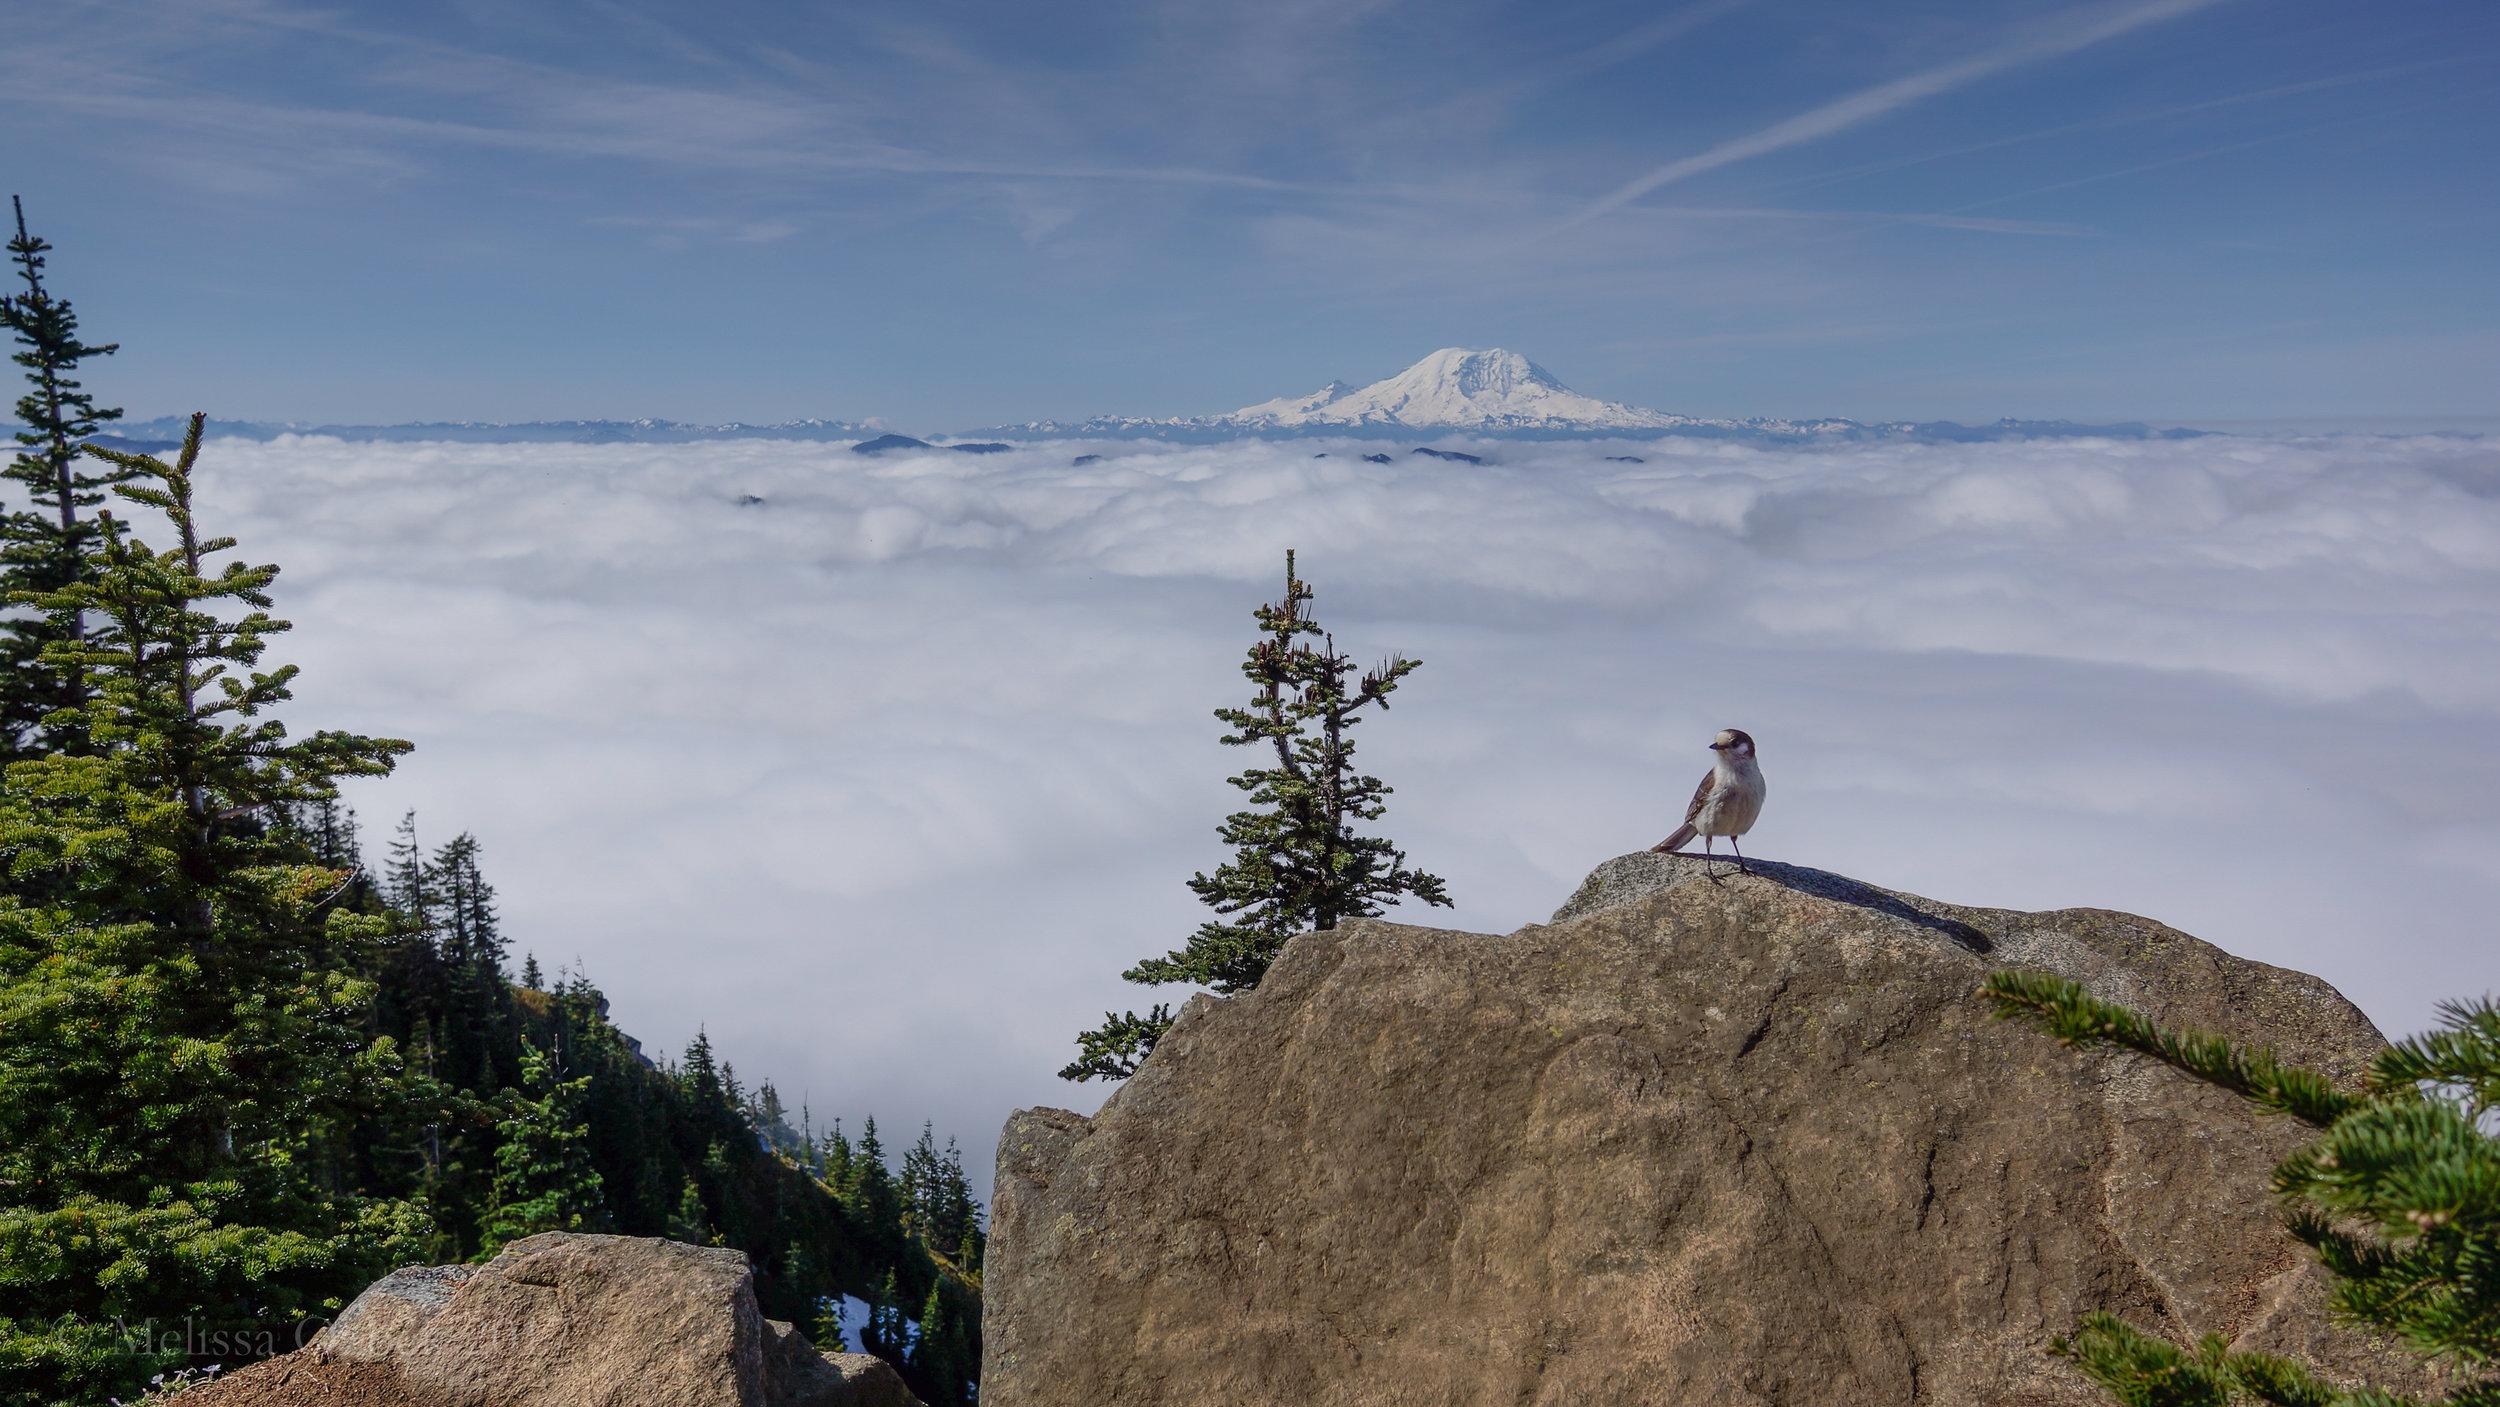 10. Bandera Mountain